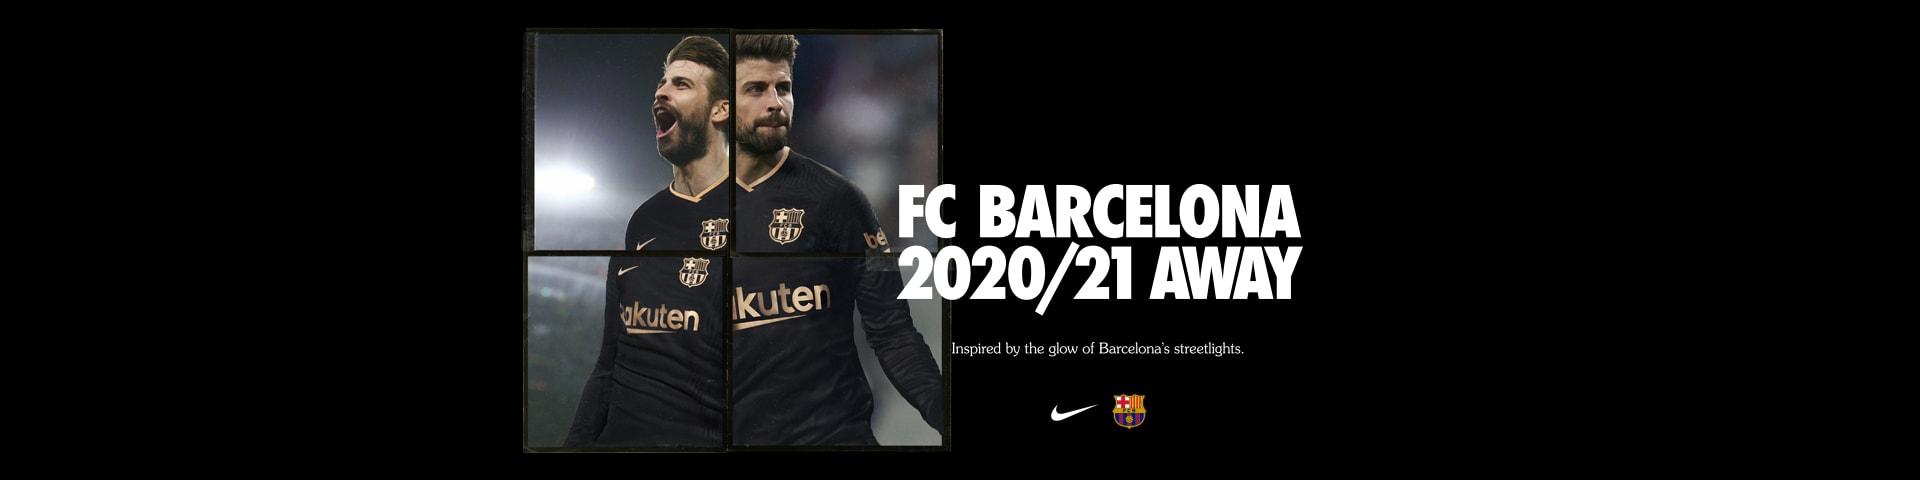 Tienda Oficial del FC Barcelona